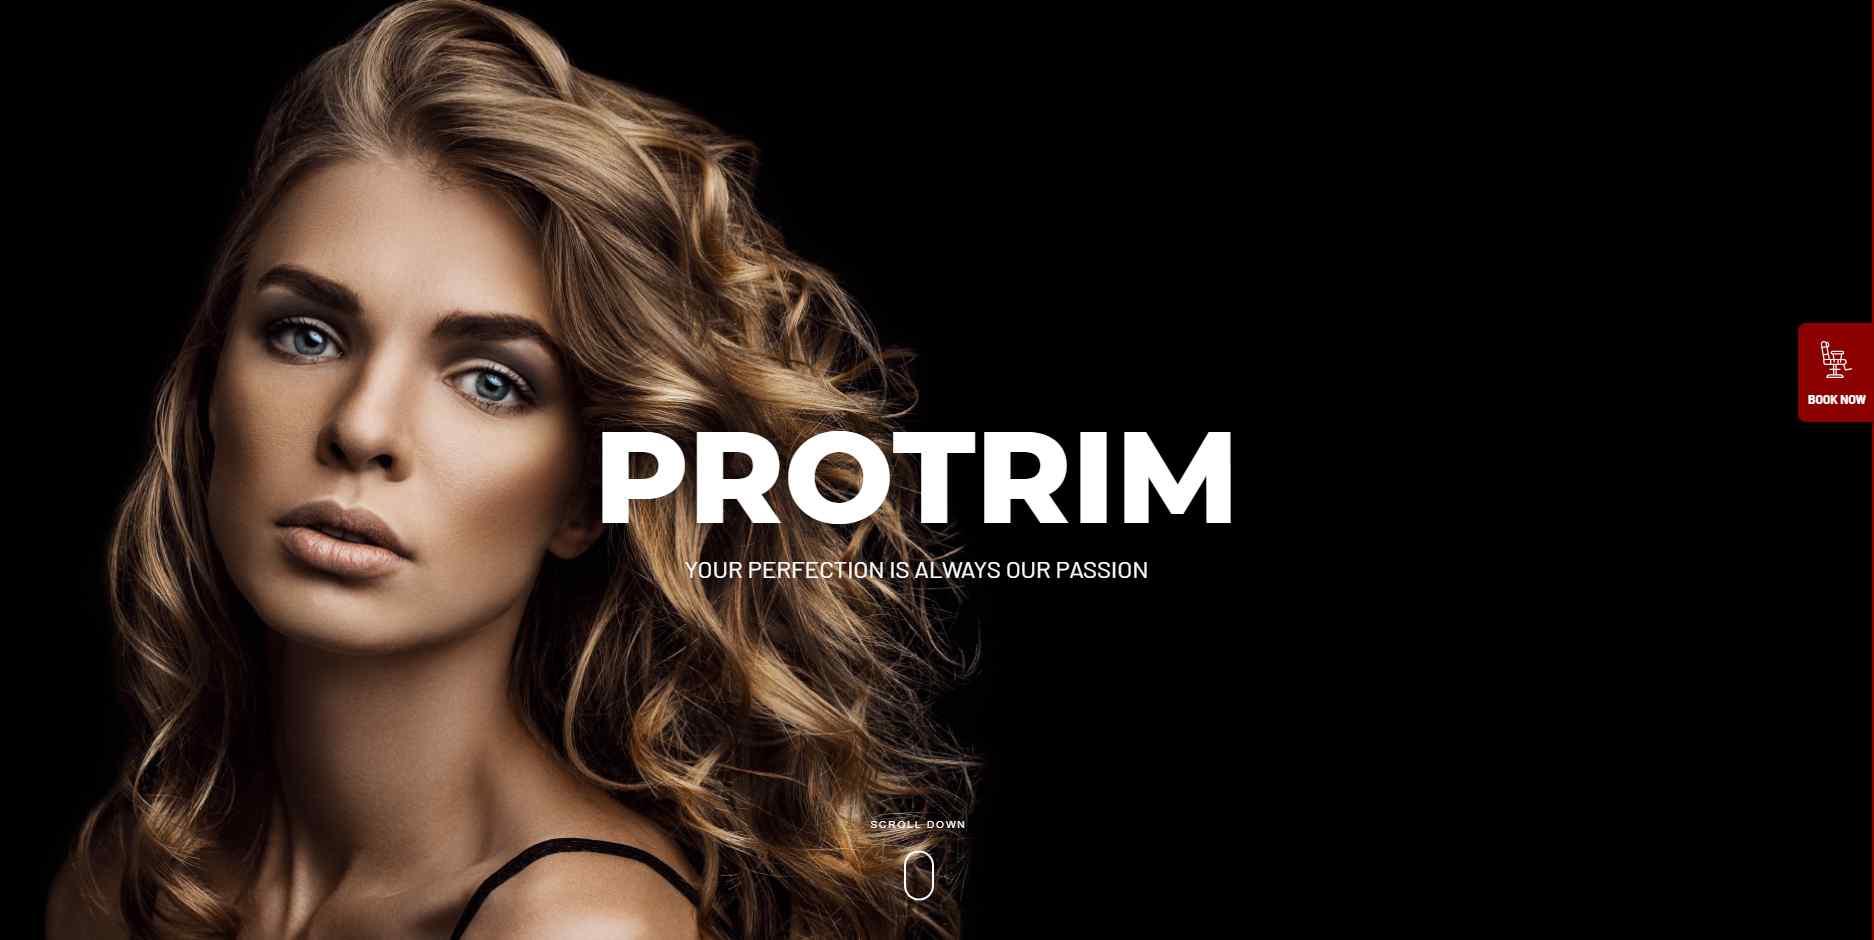 Protrim Top Hair Rebonding Salons in Singapore